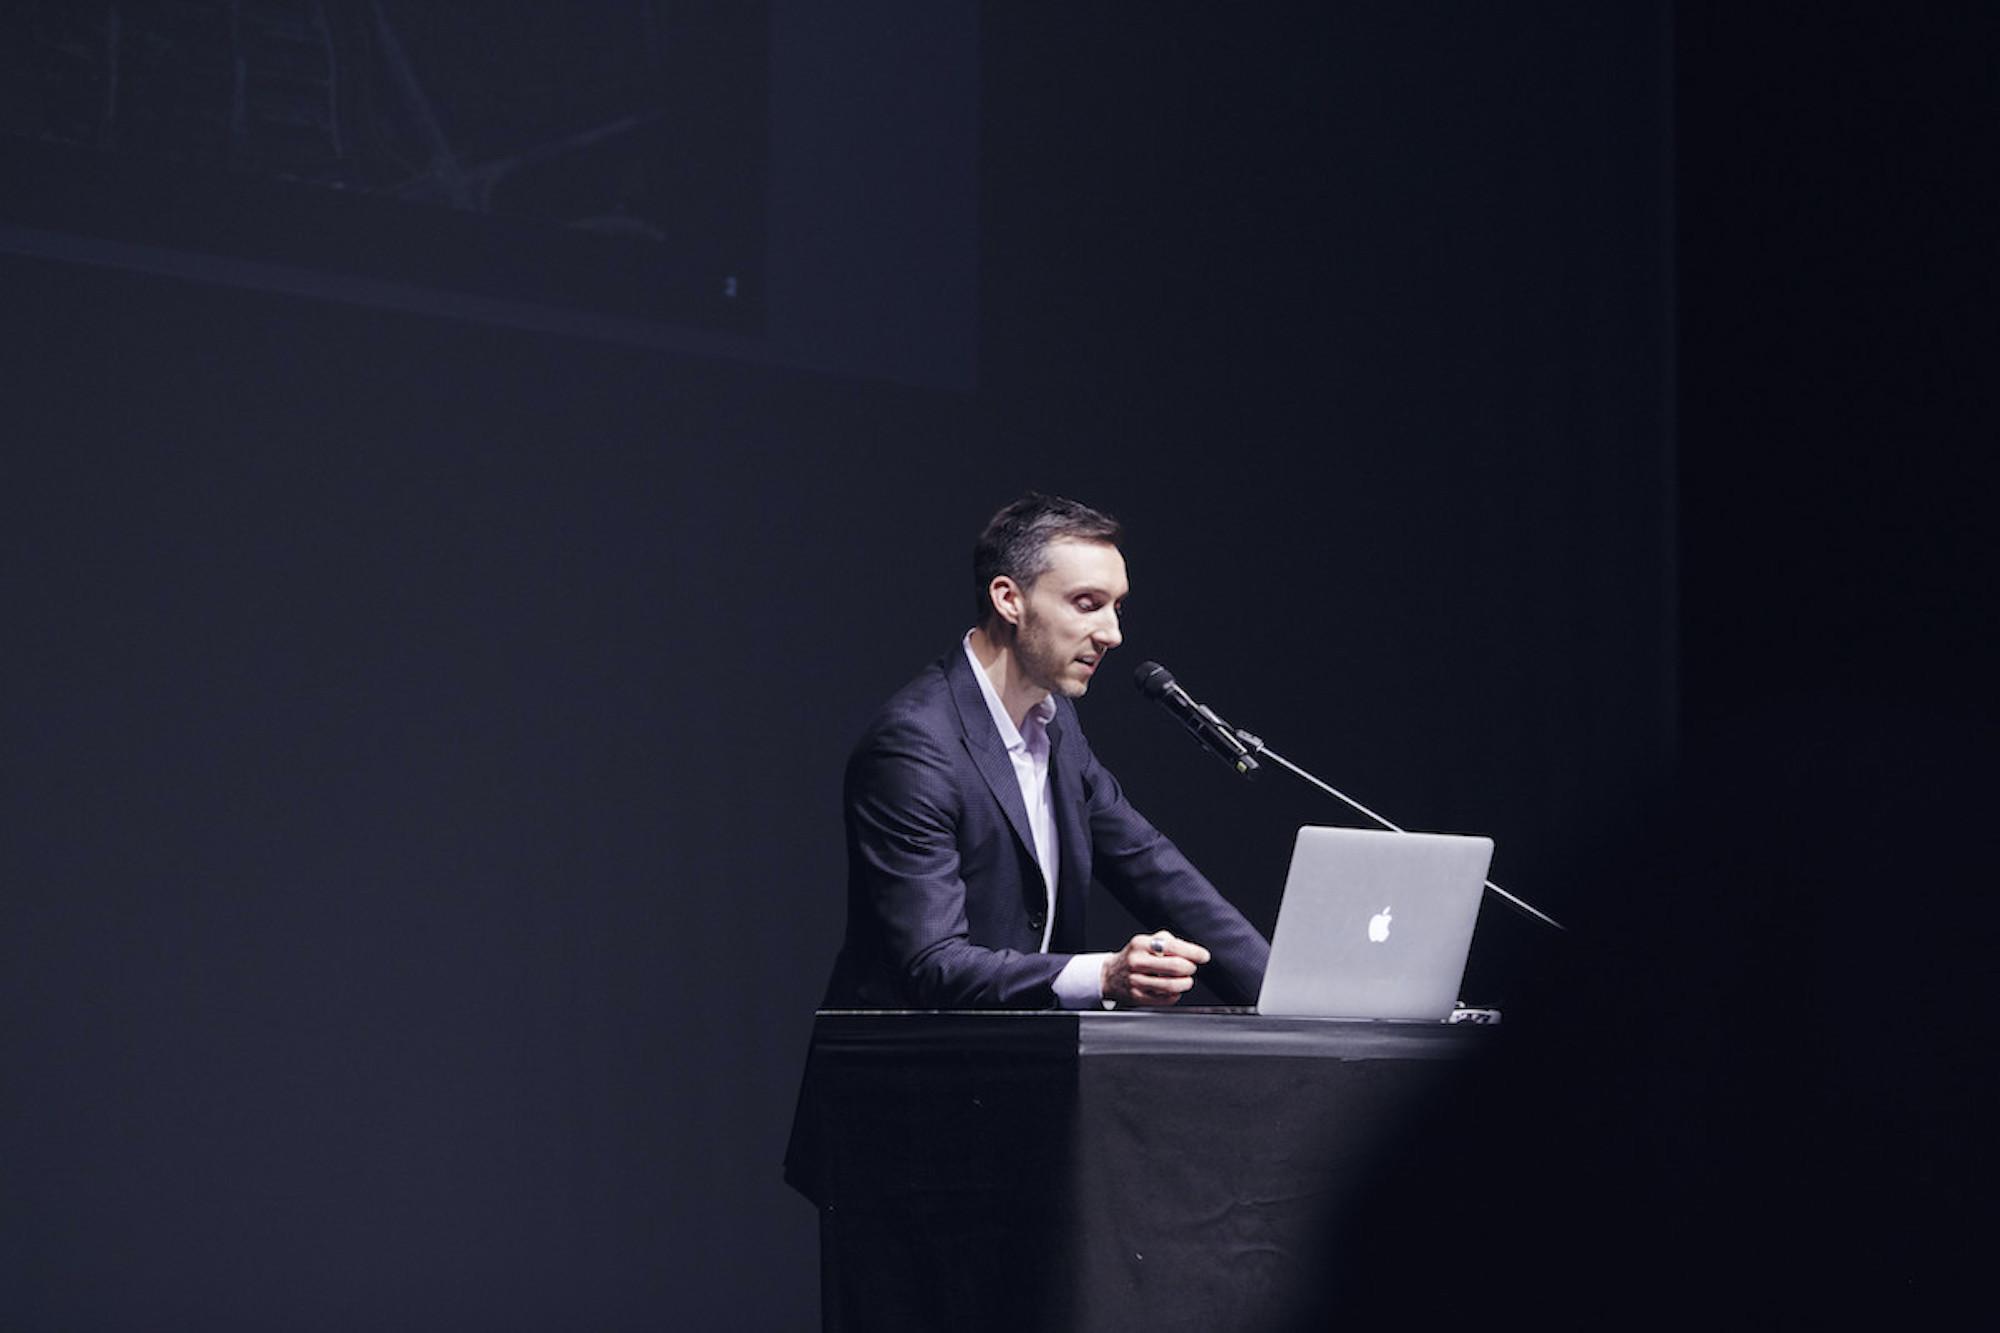 Stefan F. Höglmaier, Architecture Matters 2016 in der Reaktorhalle, München